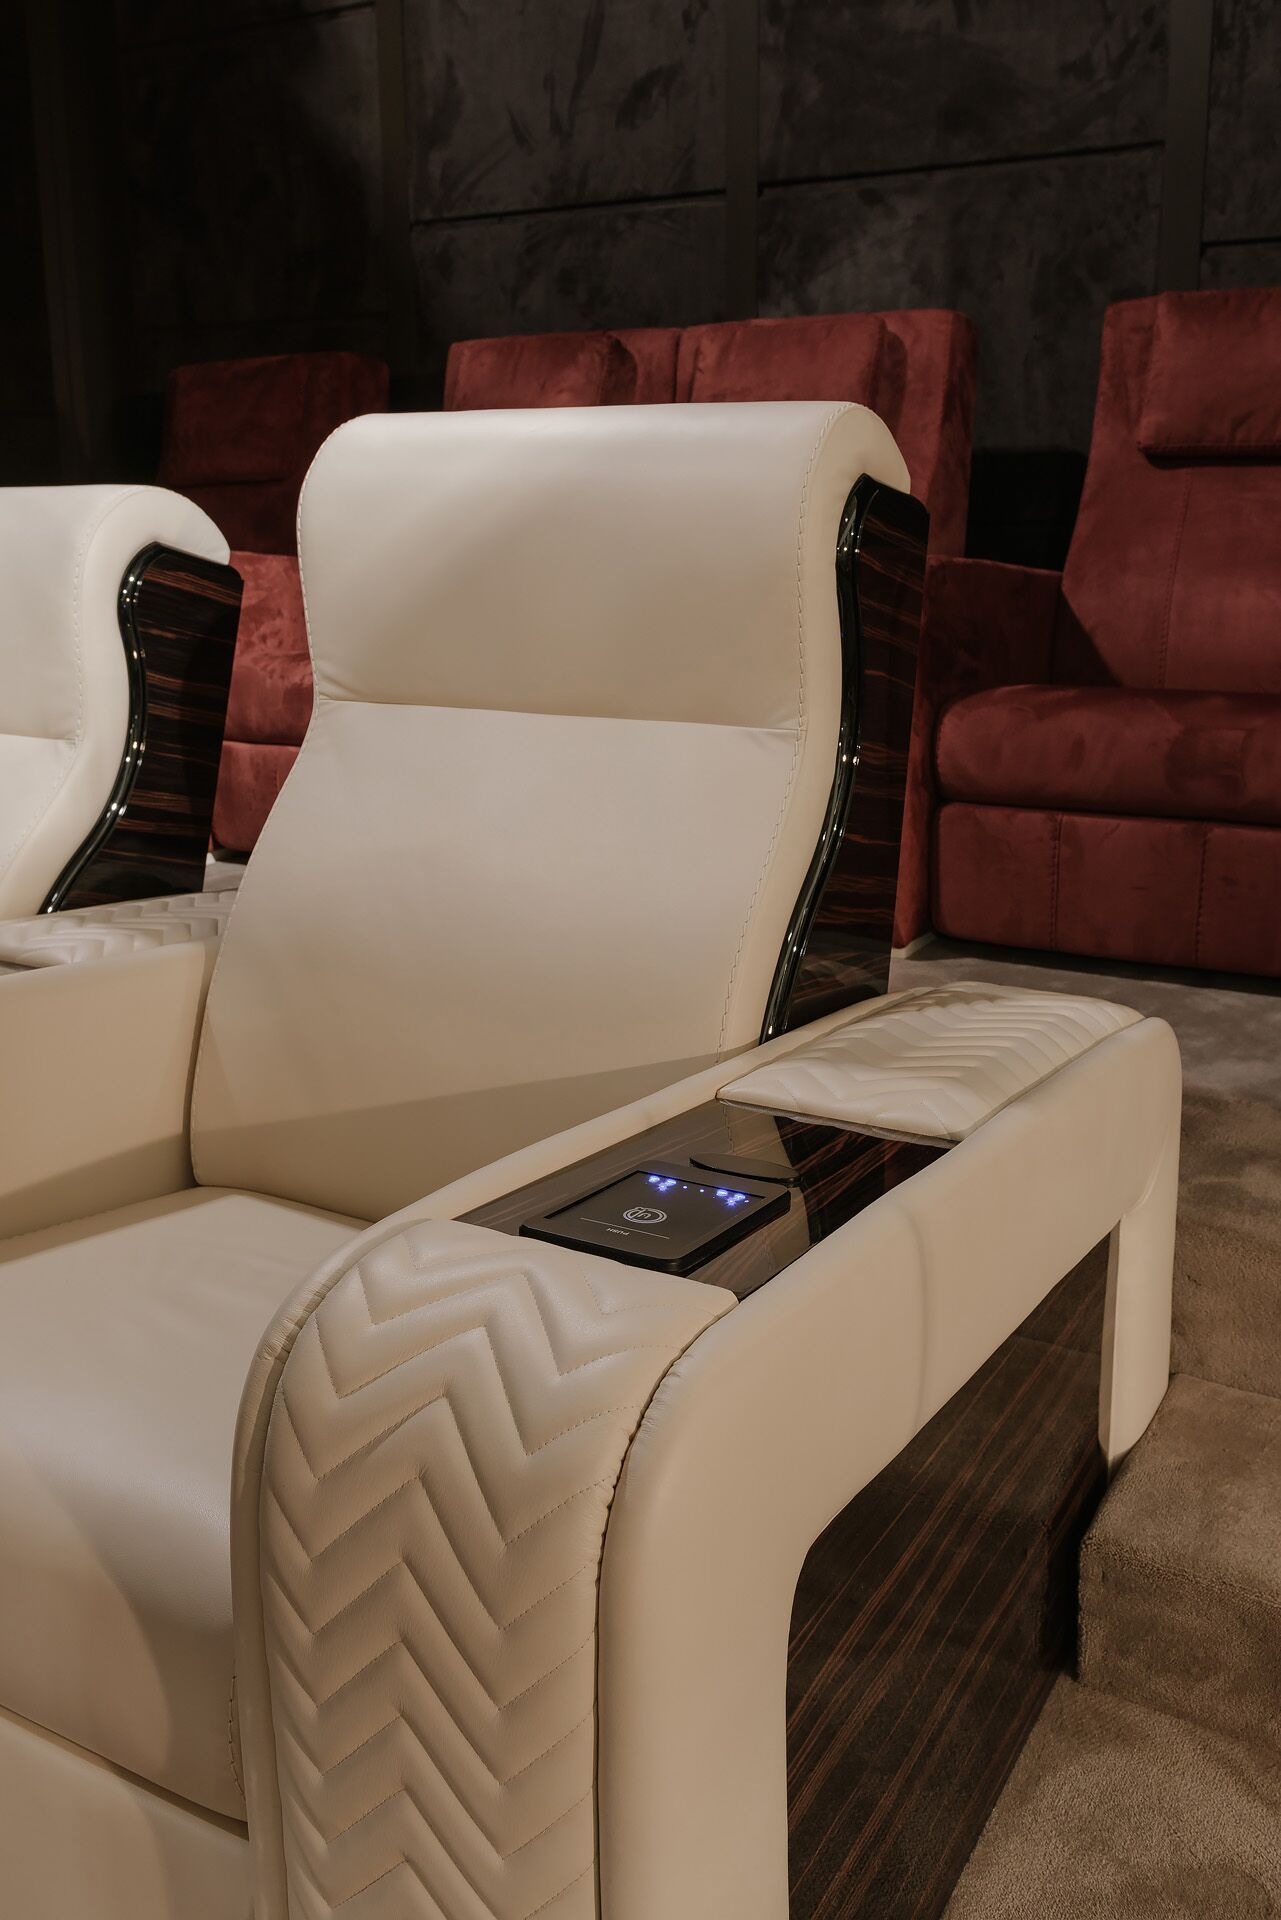 cinema seating onassis | Cinema seats, Cinema chairs, Luxury